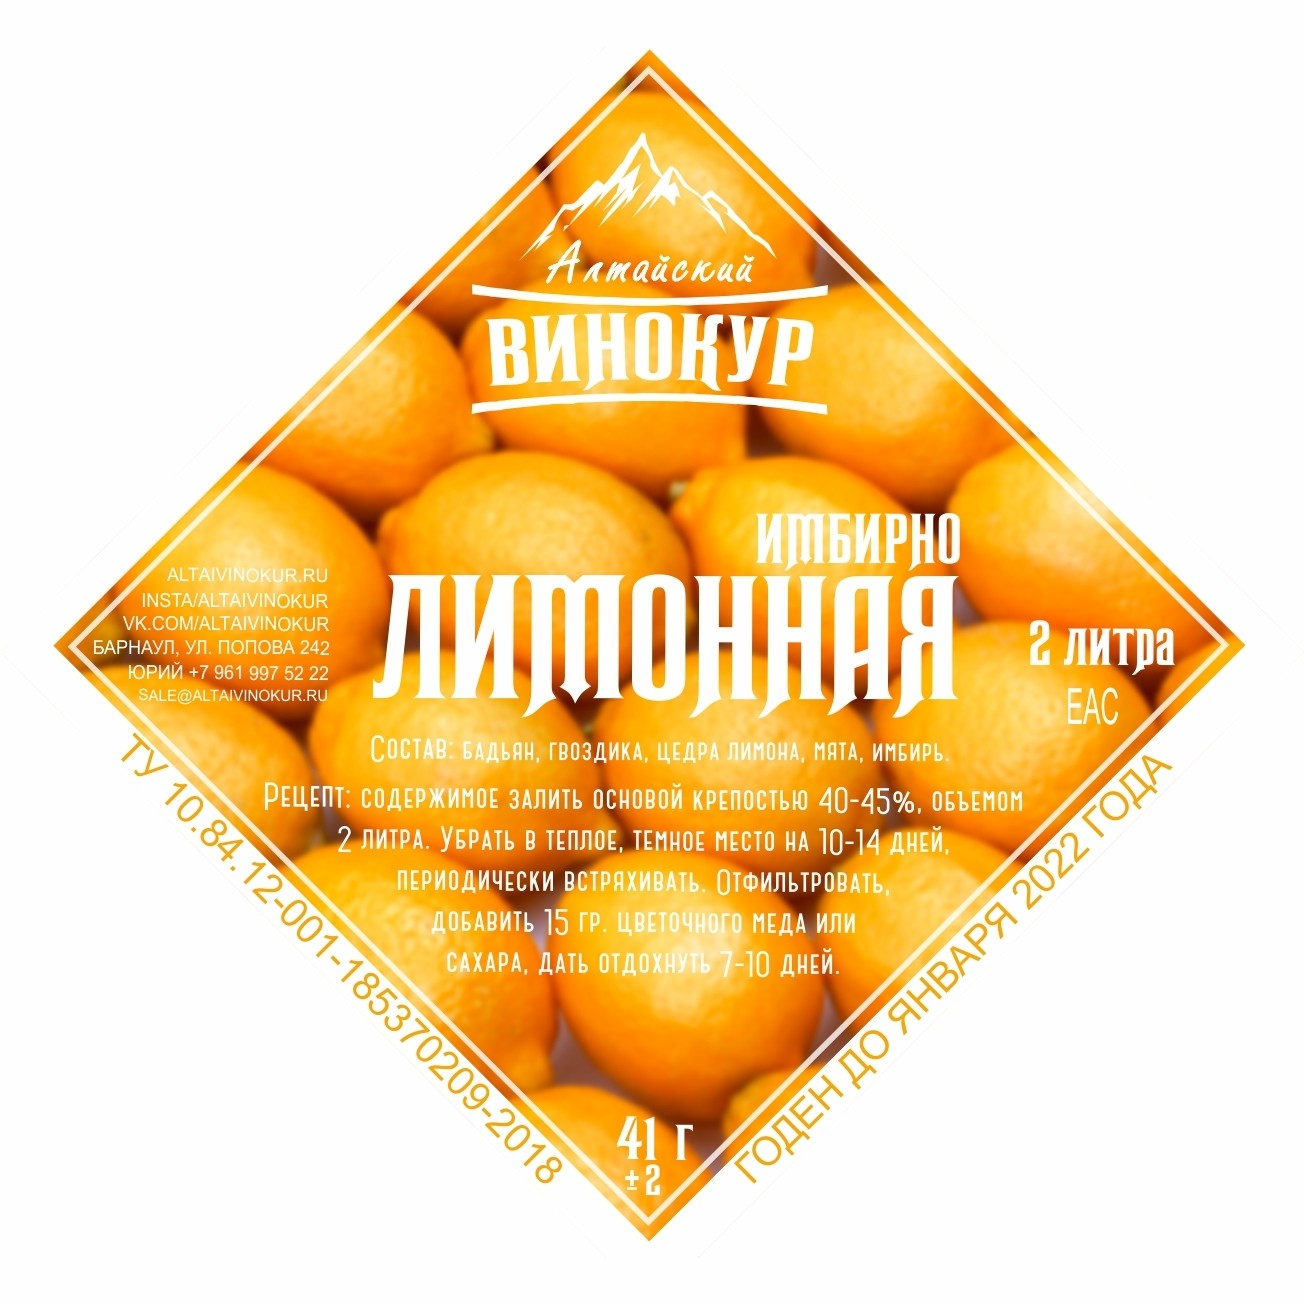 Имбирно-лимонная | Набор трав и специй